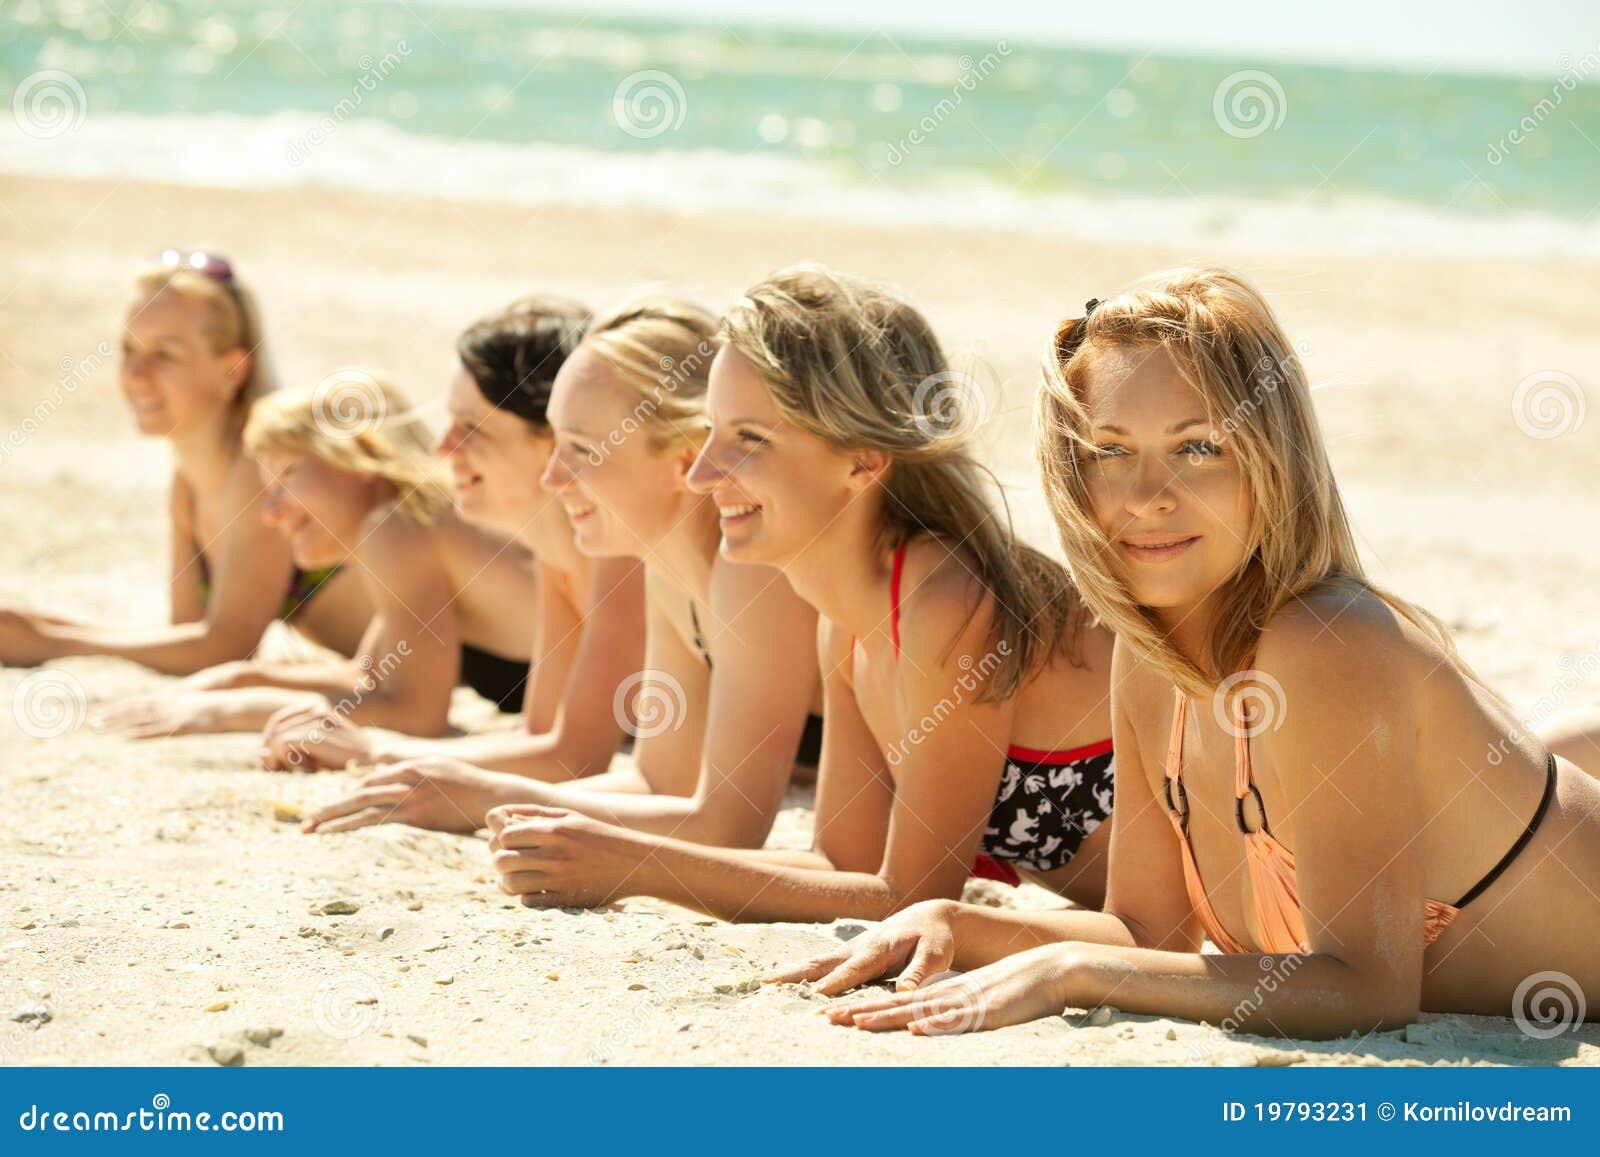 Always beach bikini girls was the